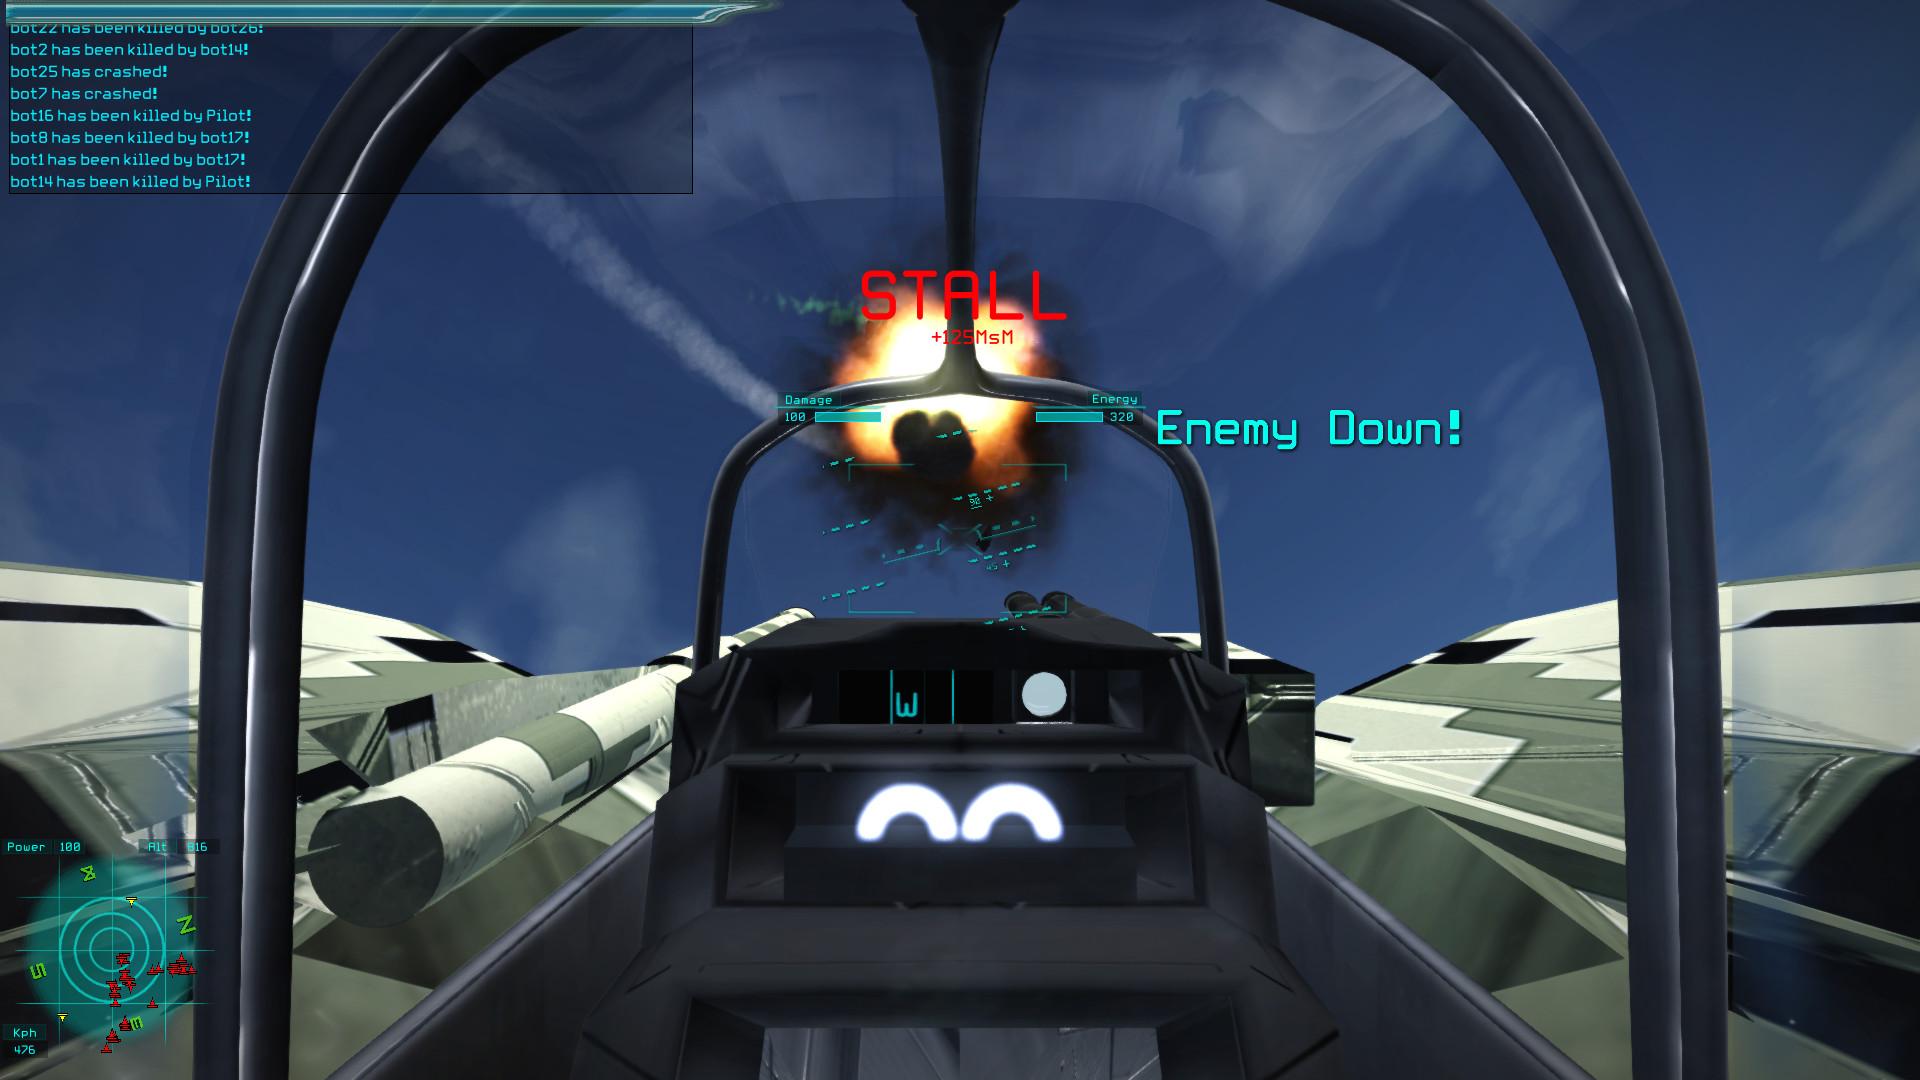 AX-EL - Air XenoDawn Review Screenshot 3